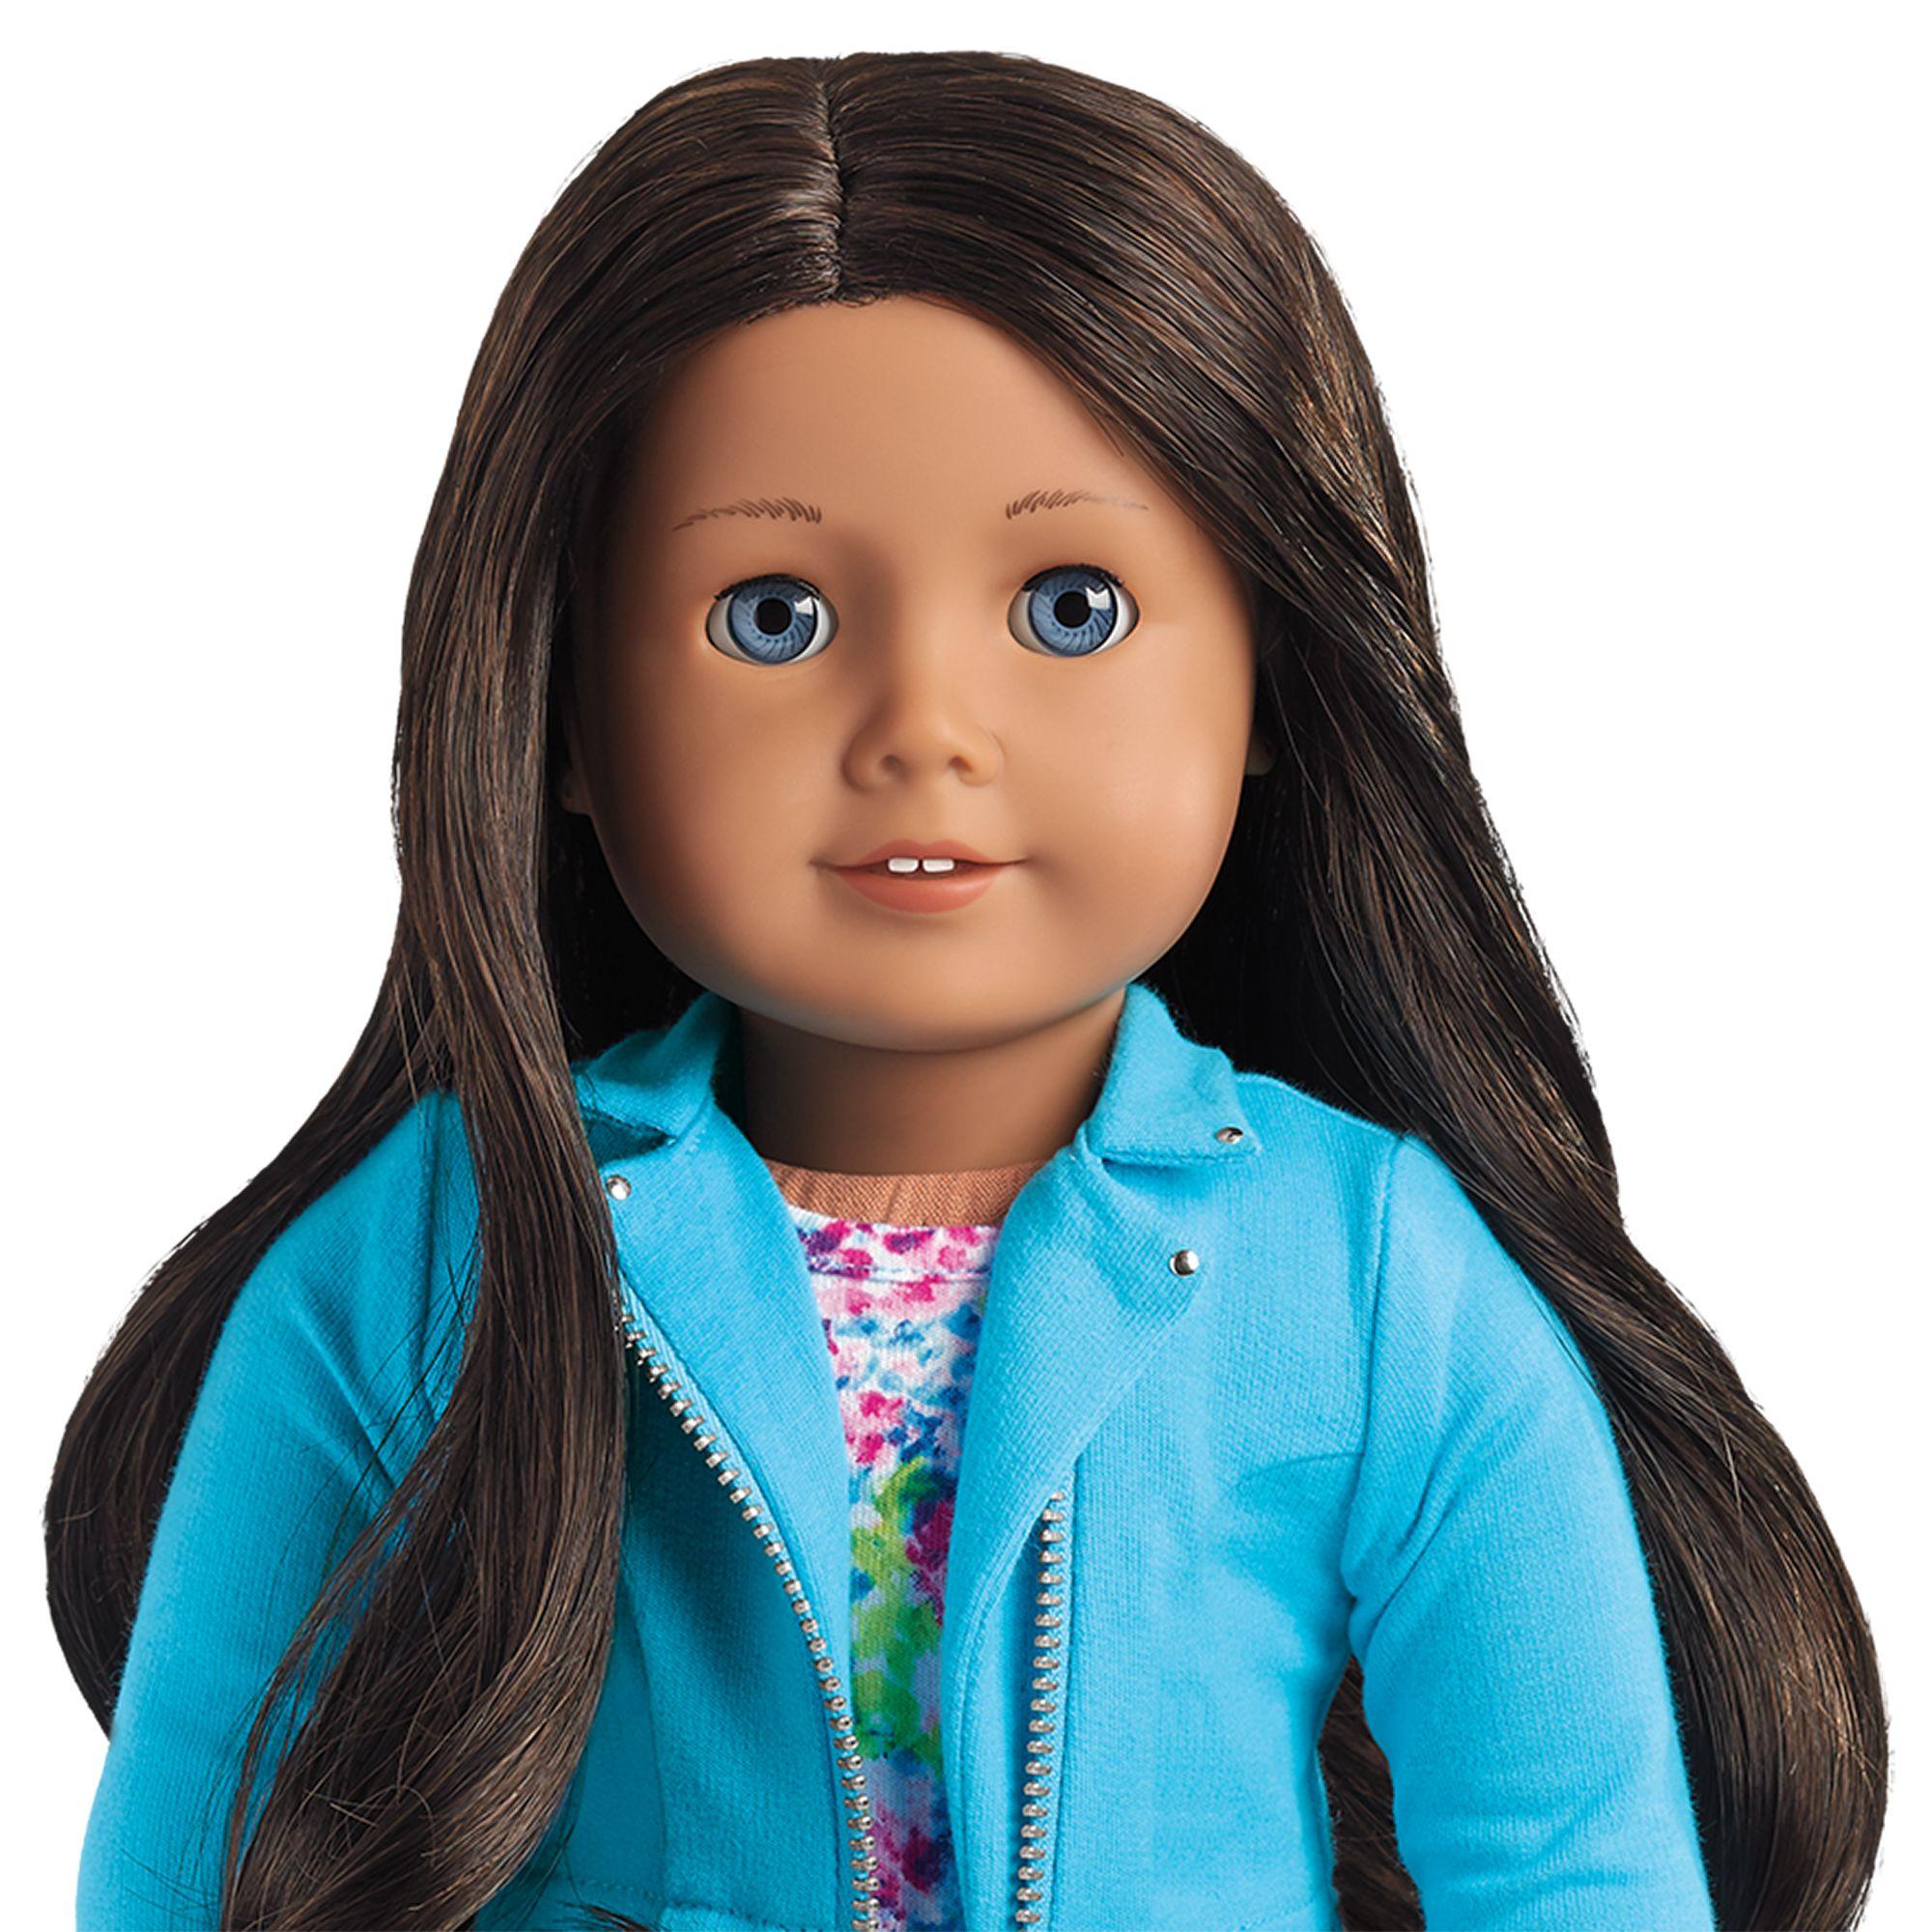 Dolls With Black Hair And Blue Eyes | Dark Brown Hairs